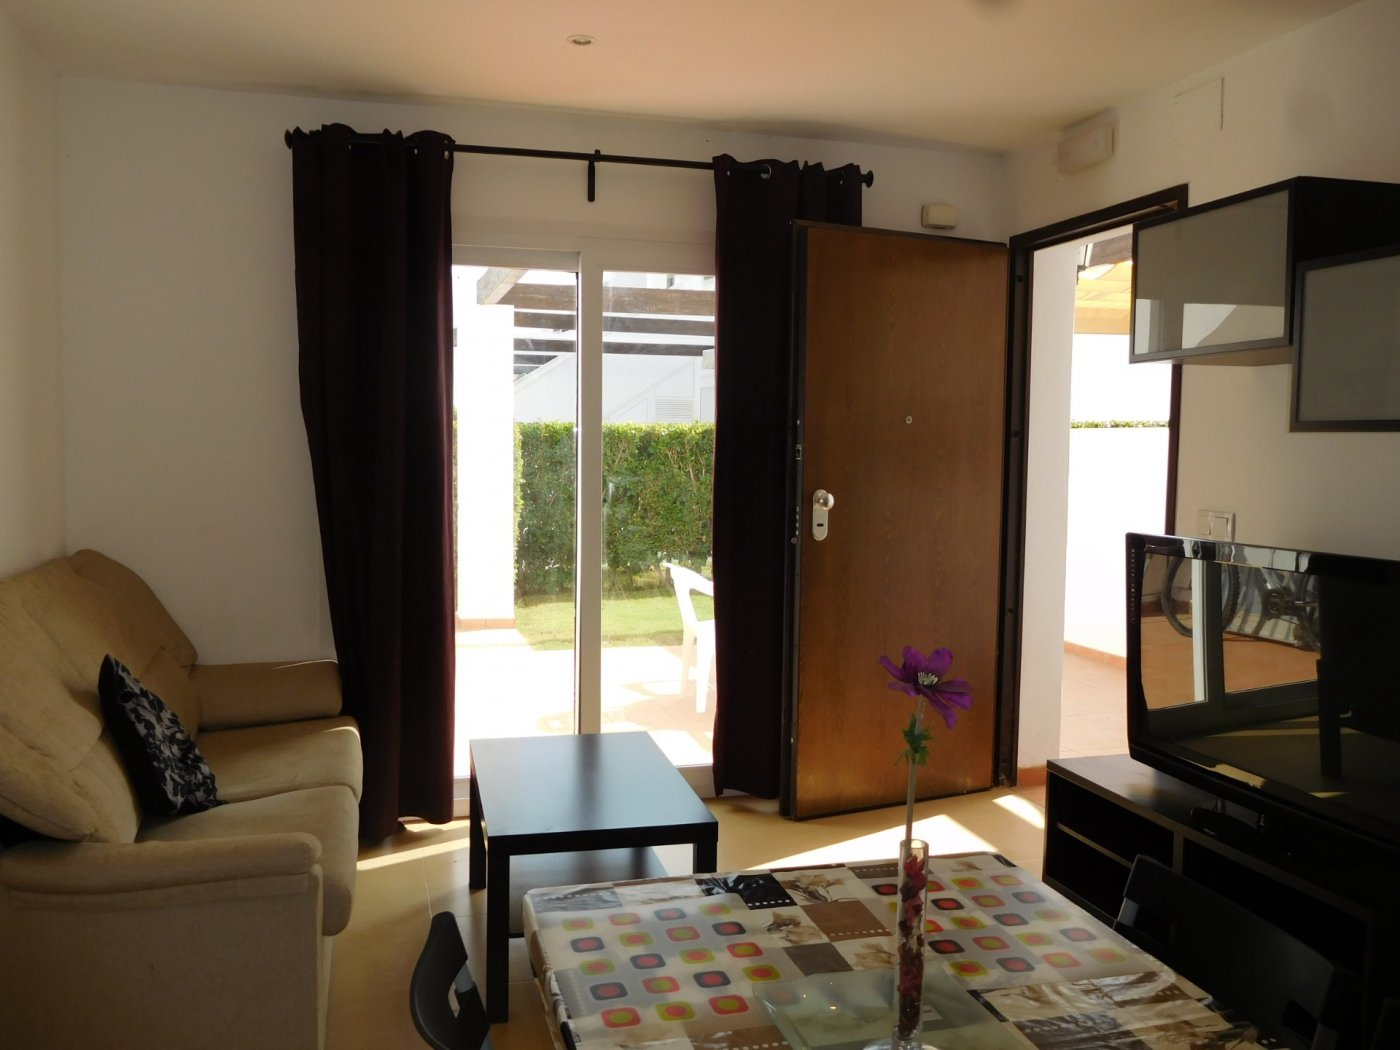 Gallery Image 3 of Apartment For rent in Condado De Alhama, Alhama De Murcia With Pool